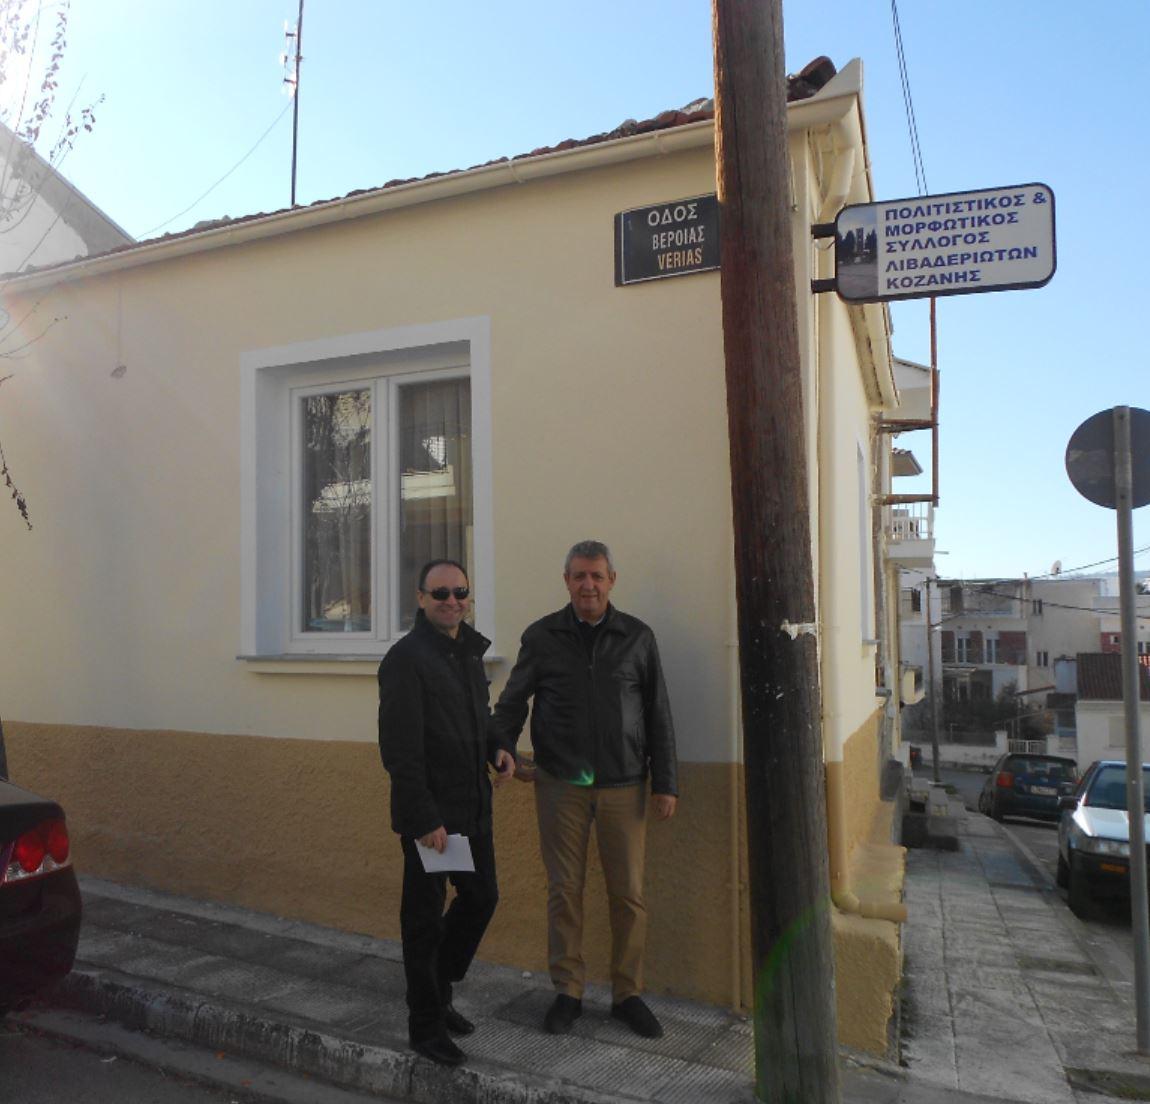 Eγκαίνια των γραφείων του Συλλόγου Λιβαδεριωτών στην Κοζάνη την Κυριακή 18 Δεκεμβρίου